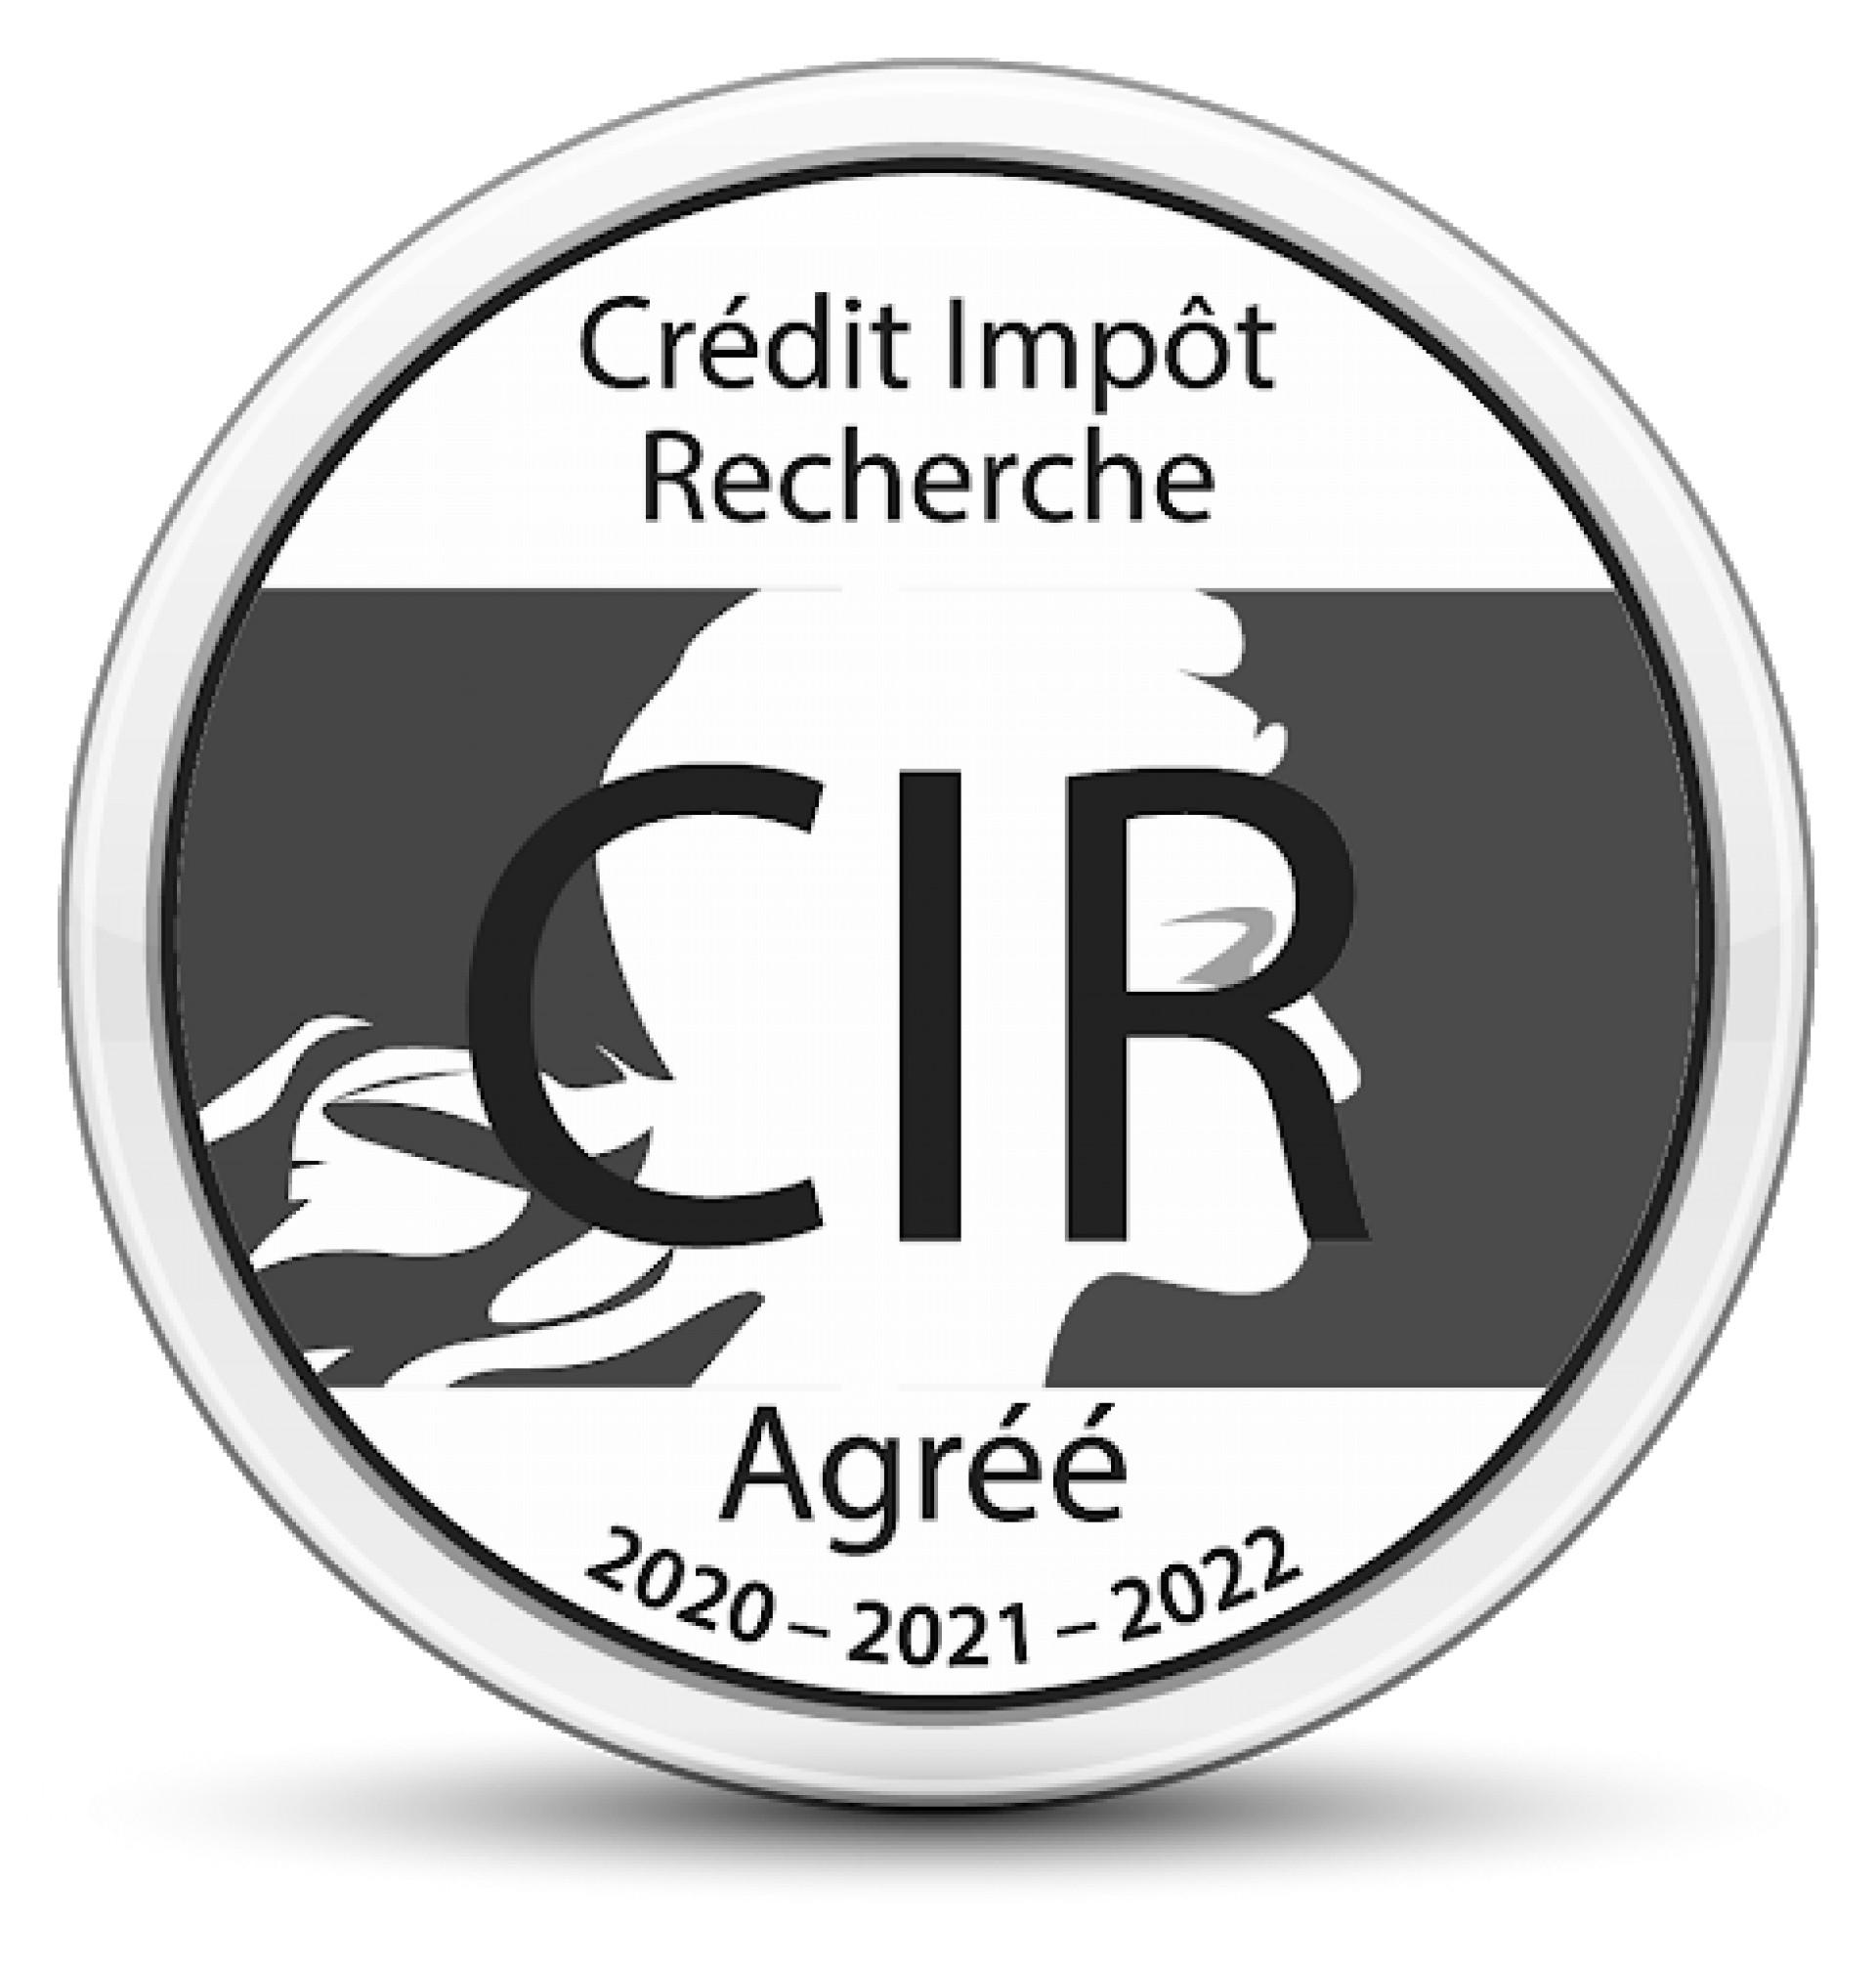 ATLANSE got CIR accreditation